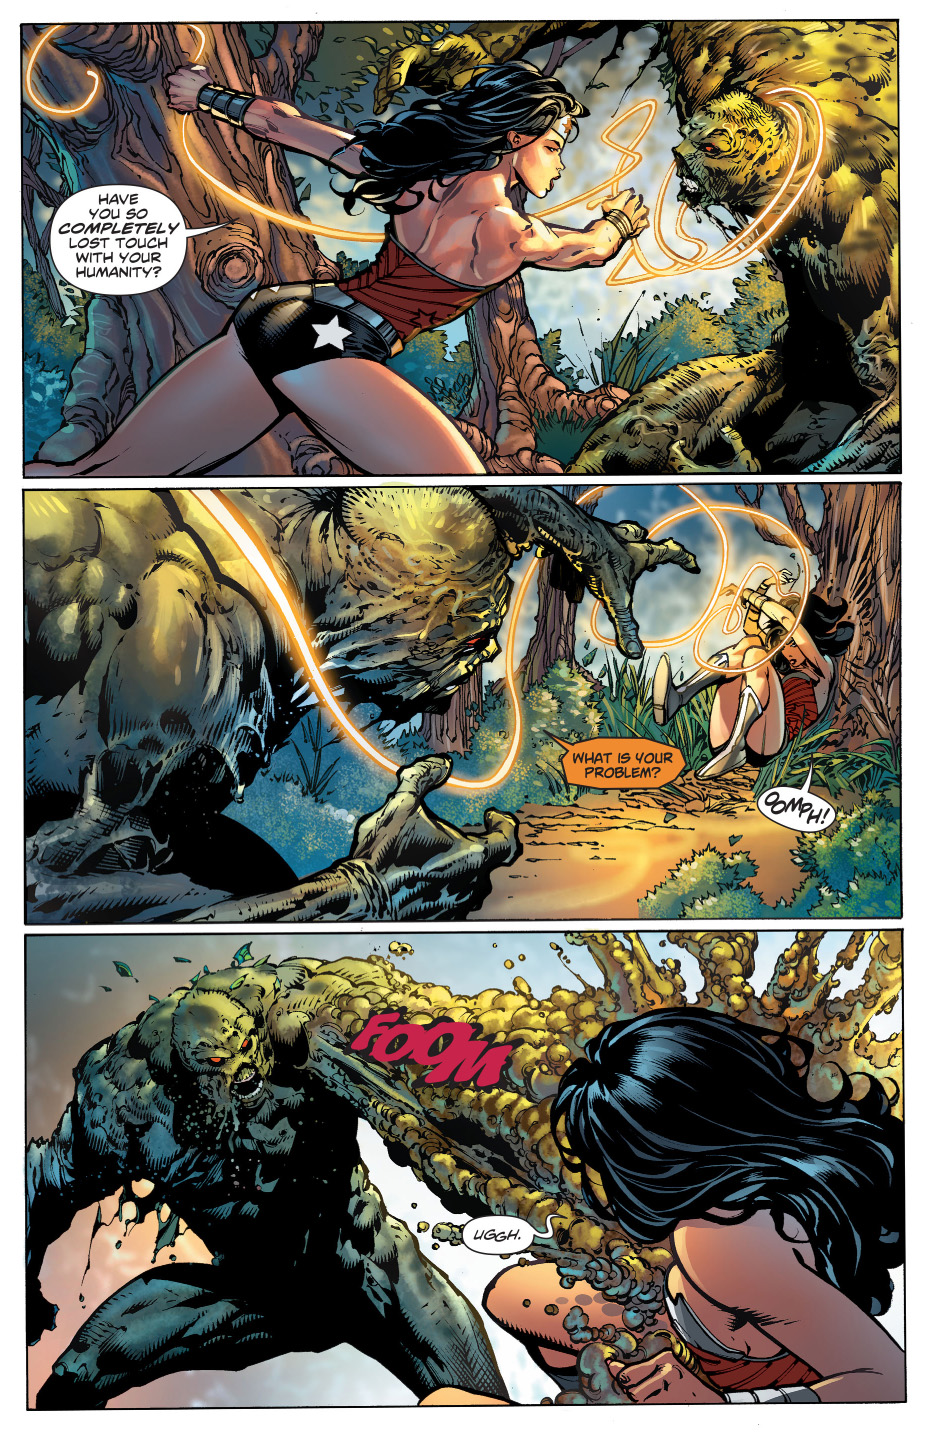 wonder woman vs swamp thing